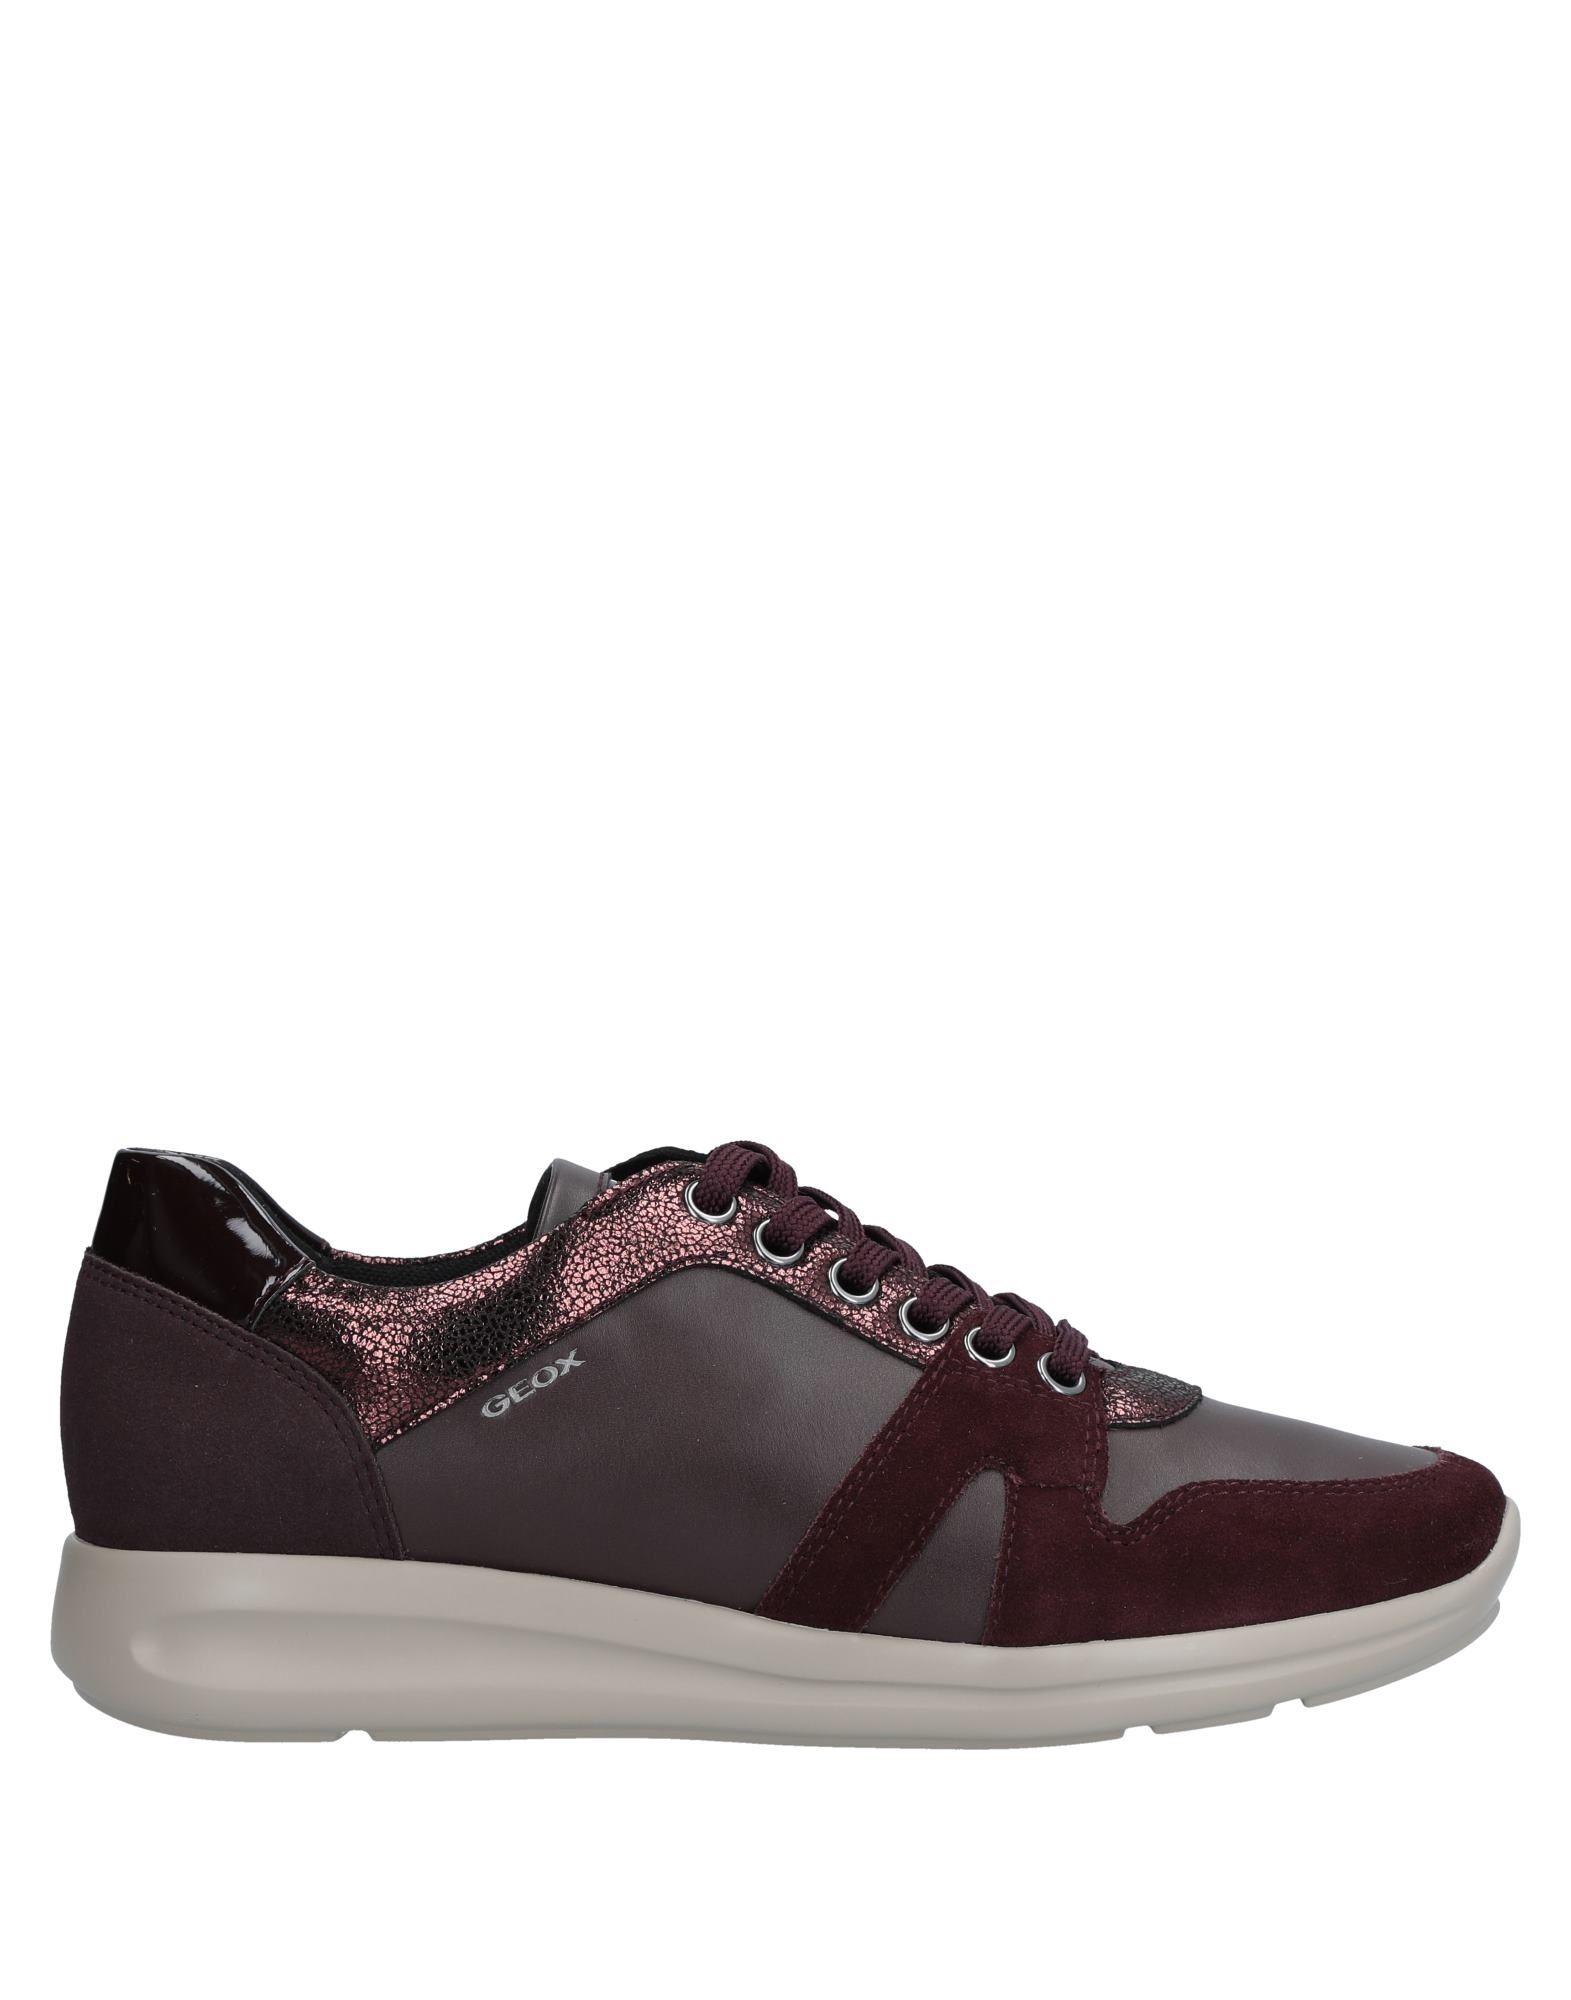 Moda Sneakers Geox Donna - 11540837JB